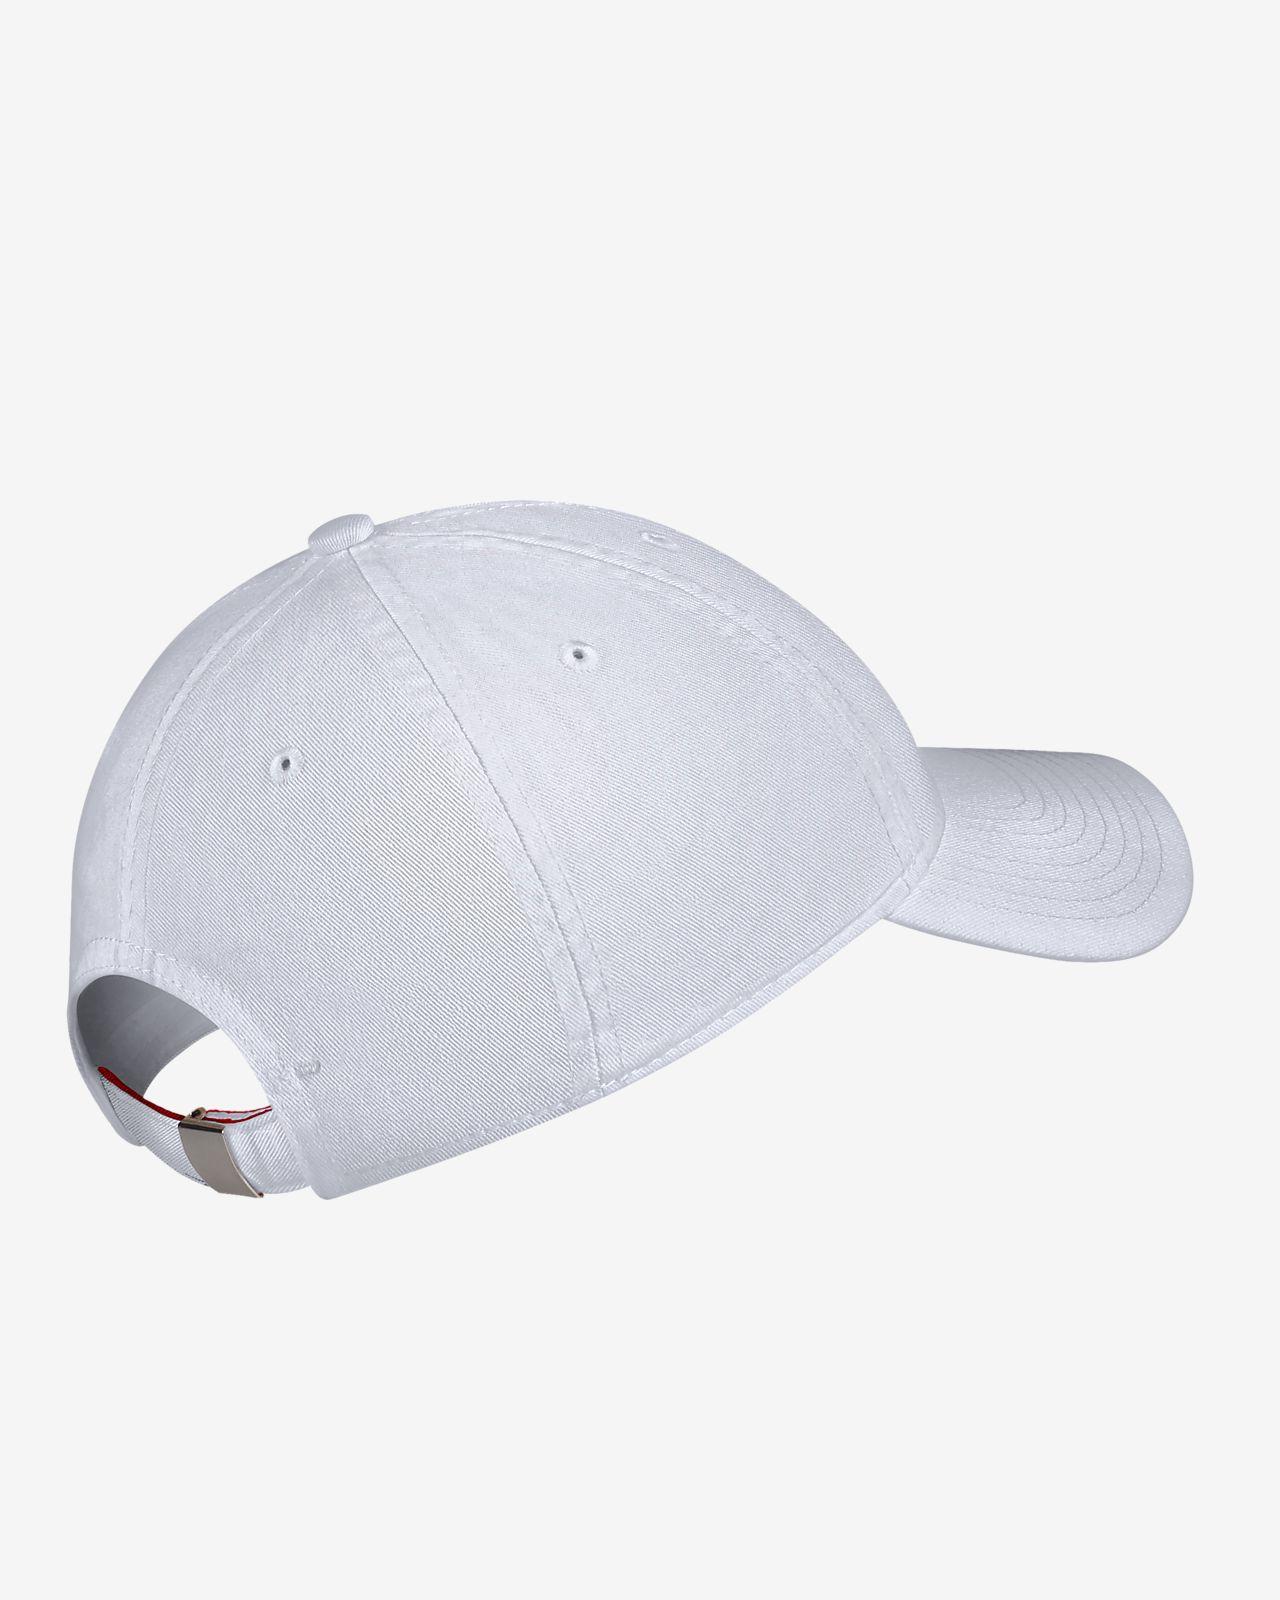 25549a09c19 Nike College Heritage86 (Ohio State) Adjustable Hat. Nike.com